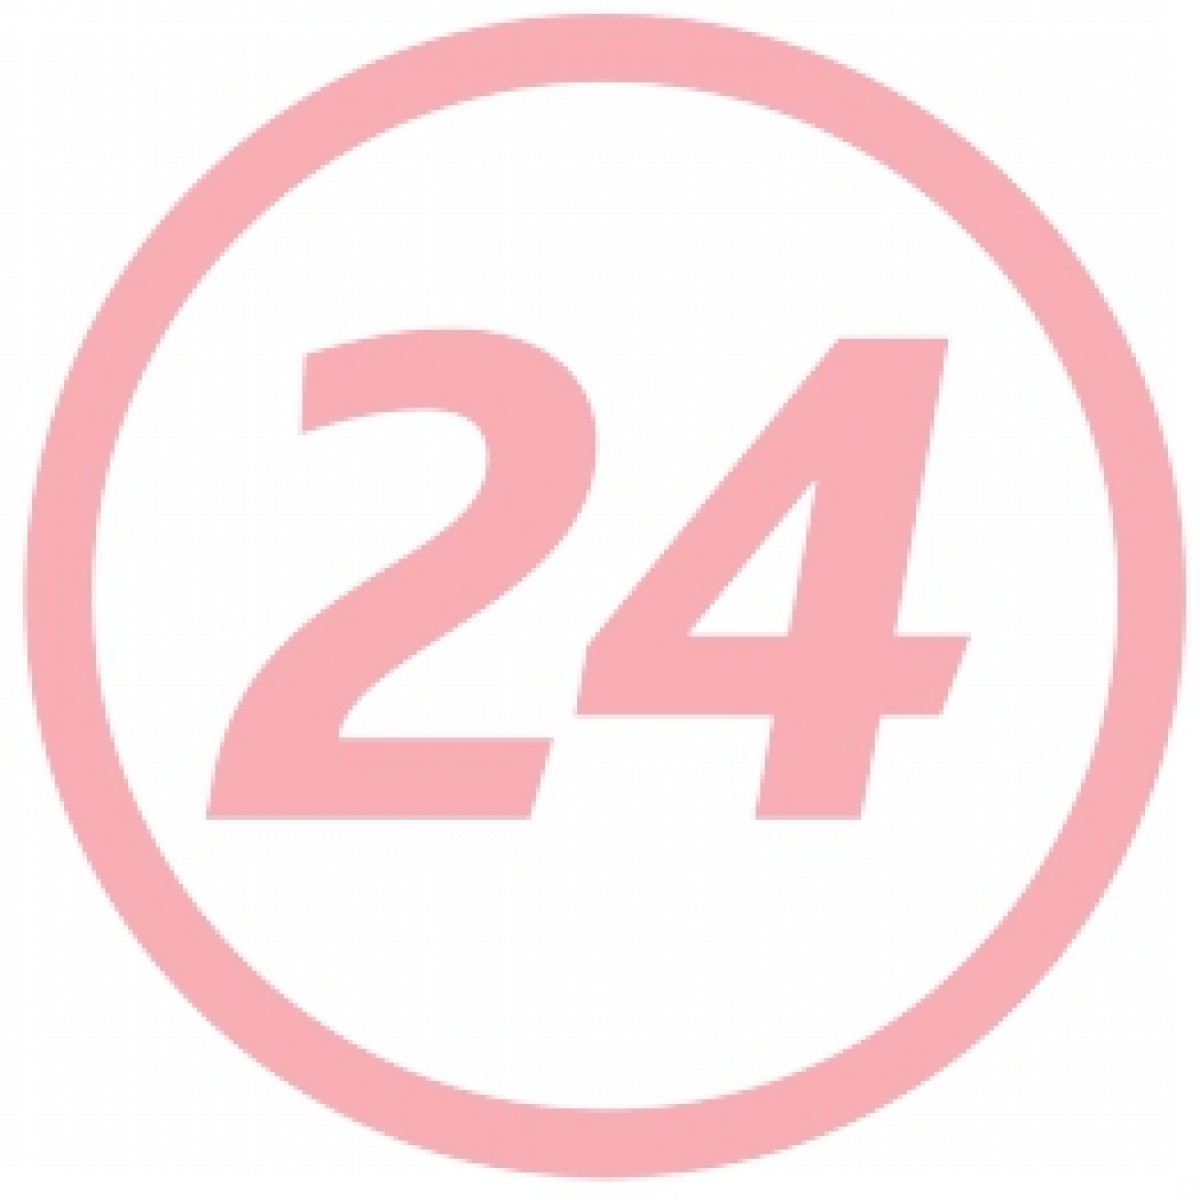 Excilor Solutie Tratament Pentru Micoza Unghiei, Solutie, 3.3ml